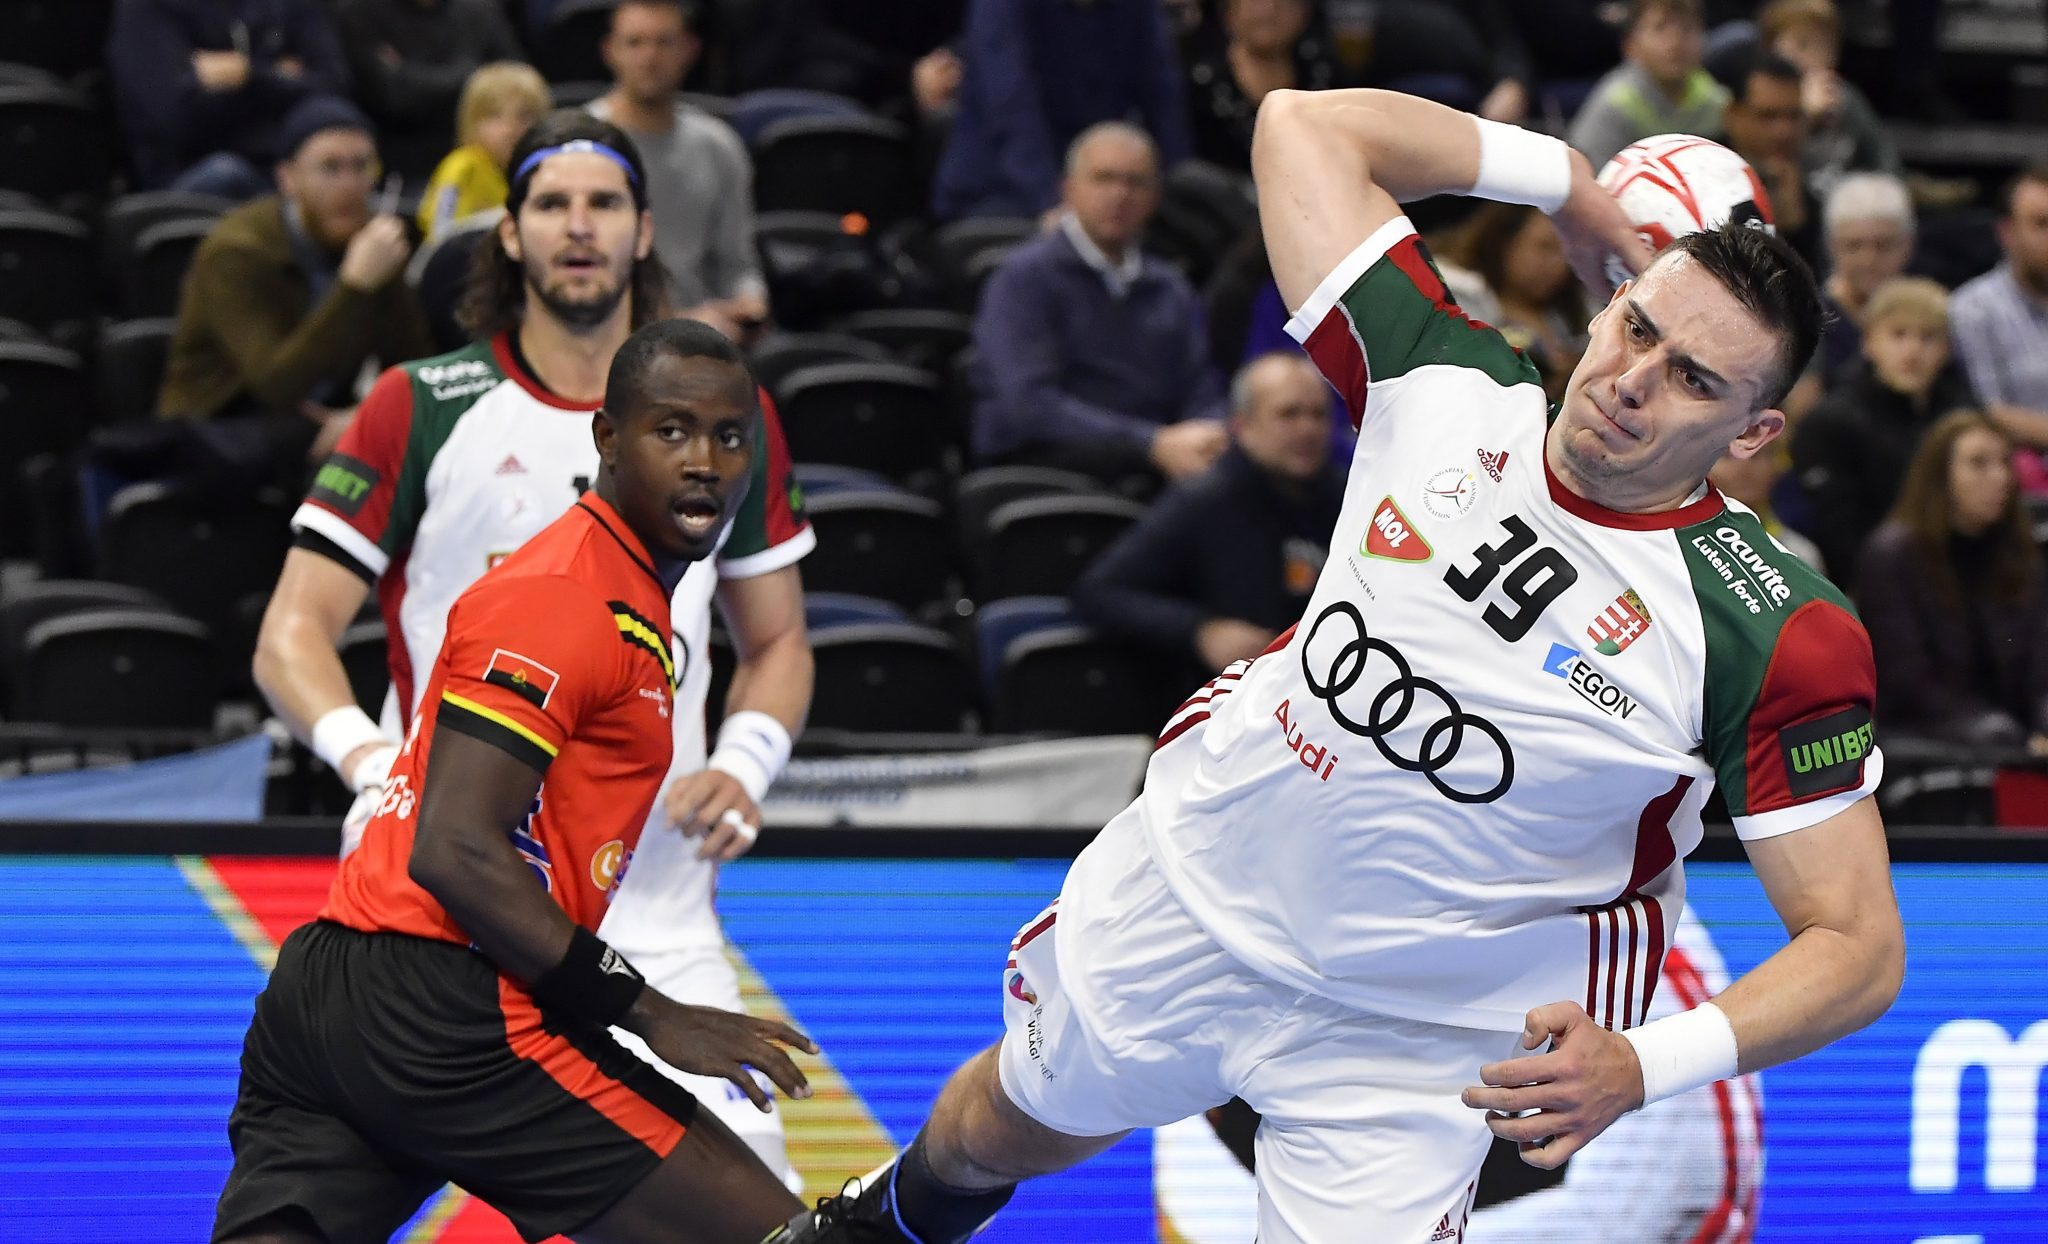 Handball Hungary 2019